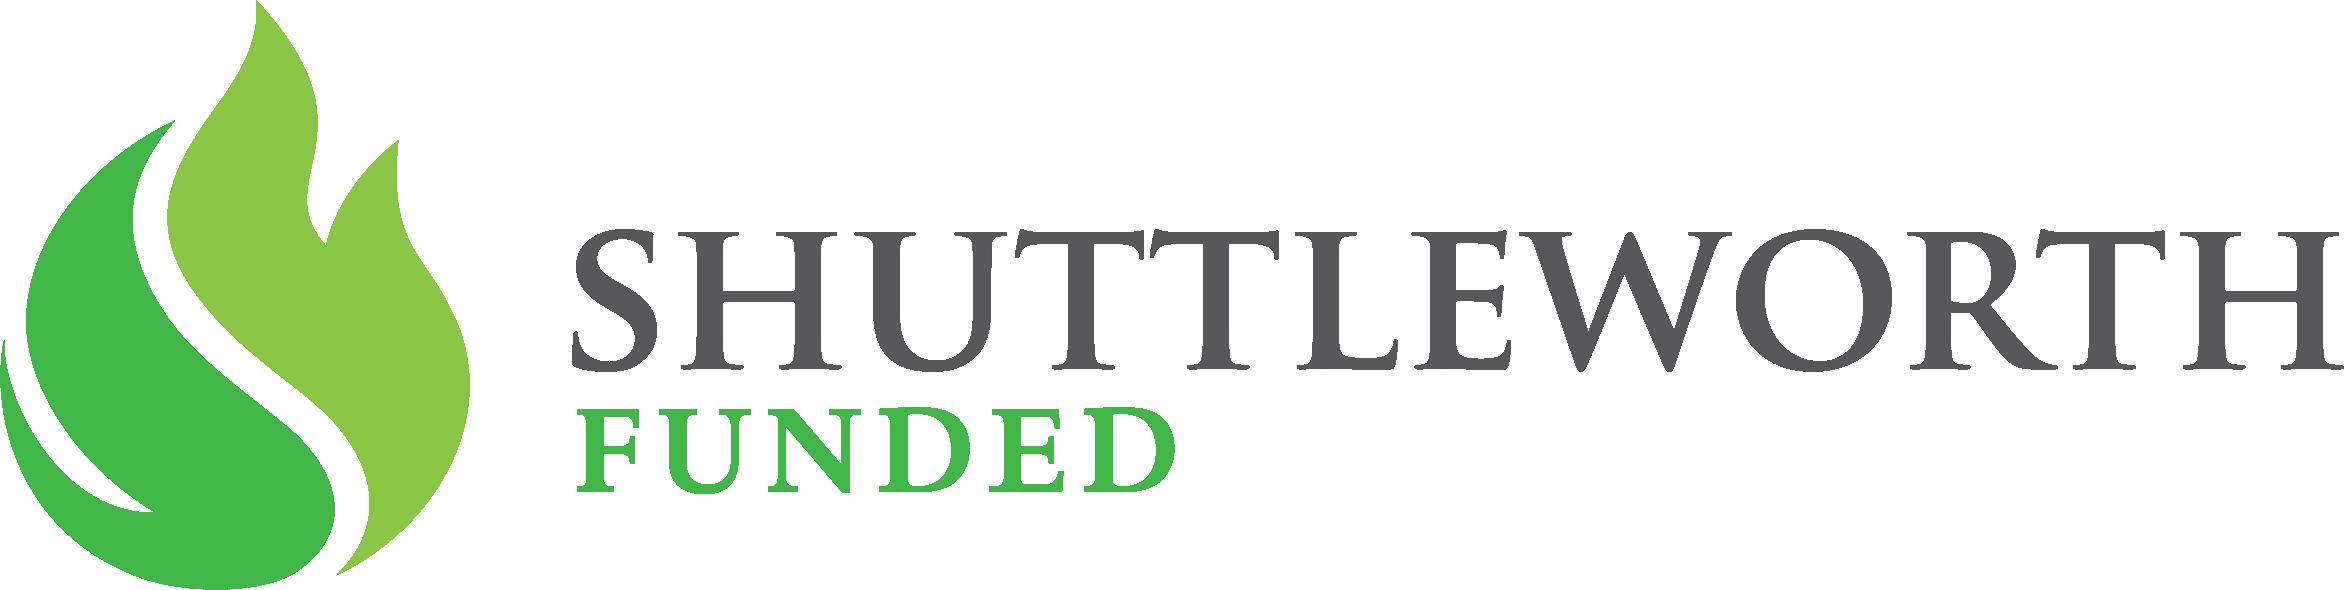 Shuttleworth aaeb6184d0f15652ba9825dc358abfb6c71c086574615b14a705b94a223c0308